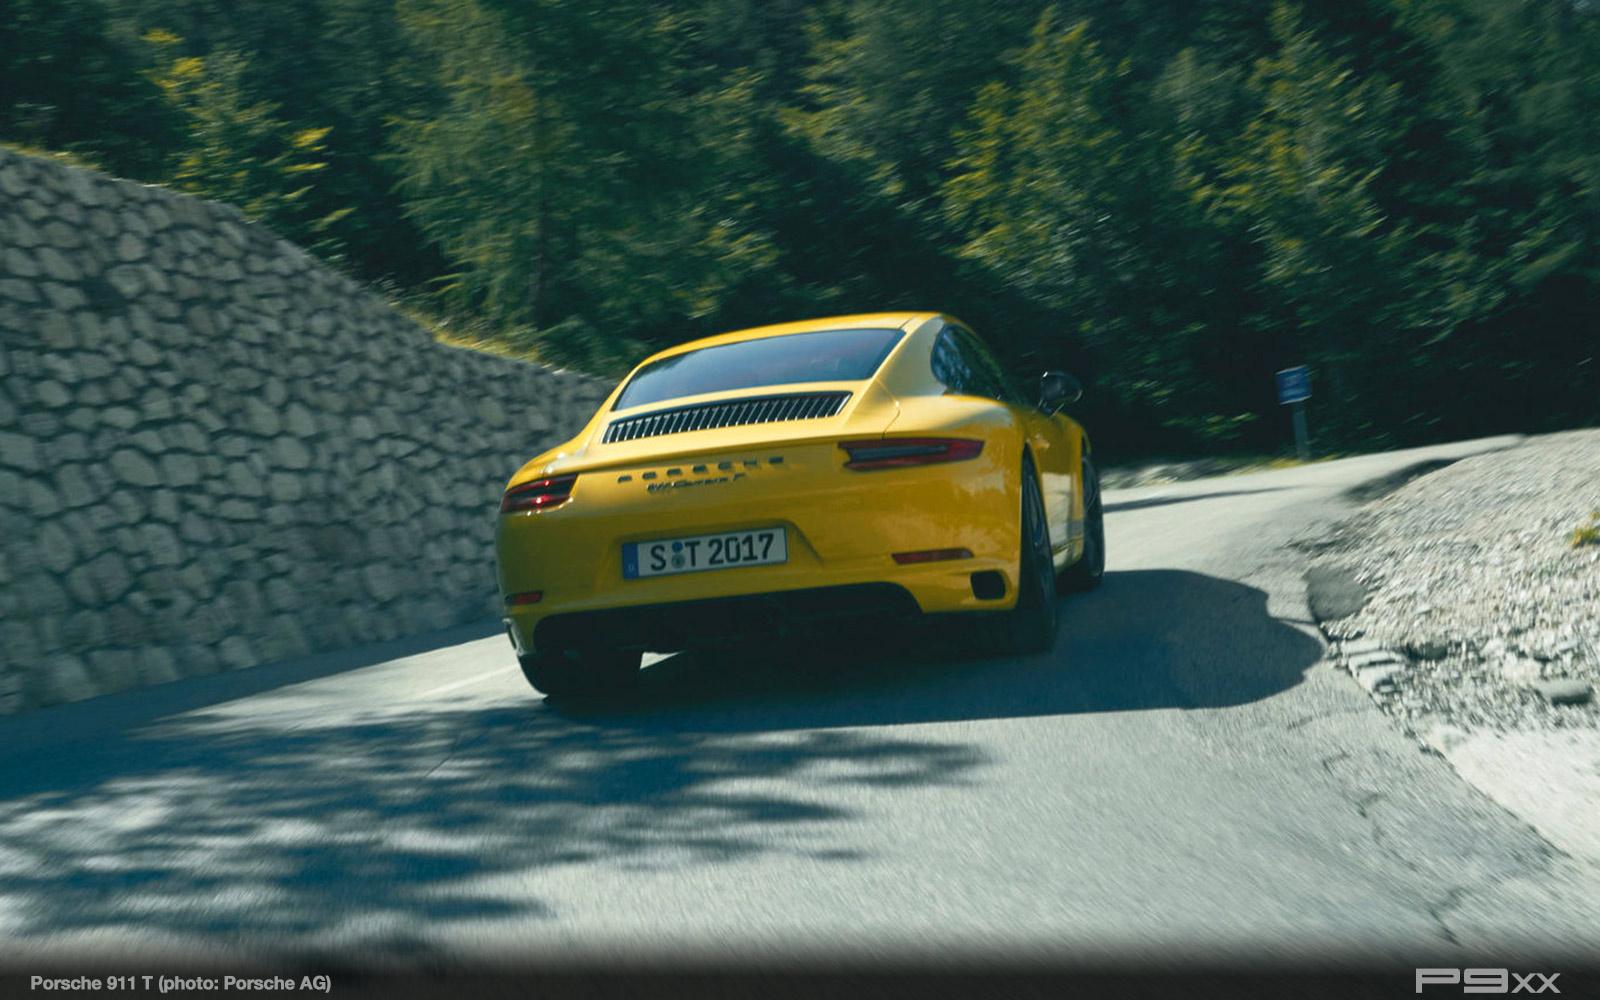 Porsche-911-Carrera-T-328